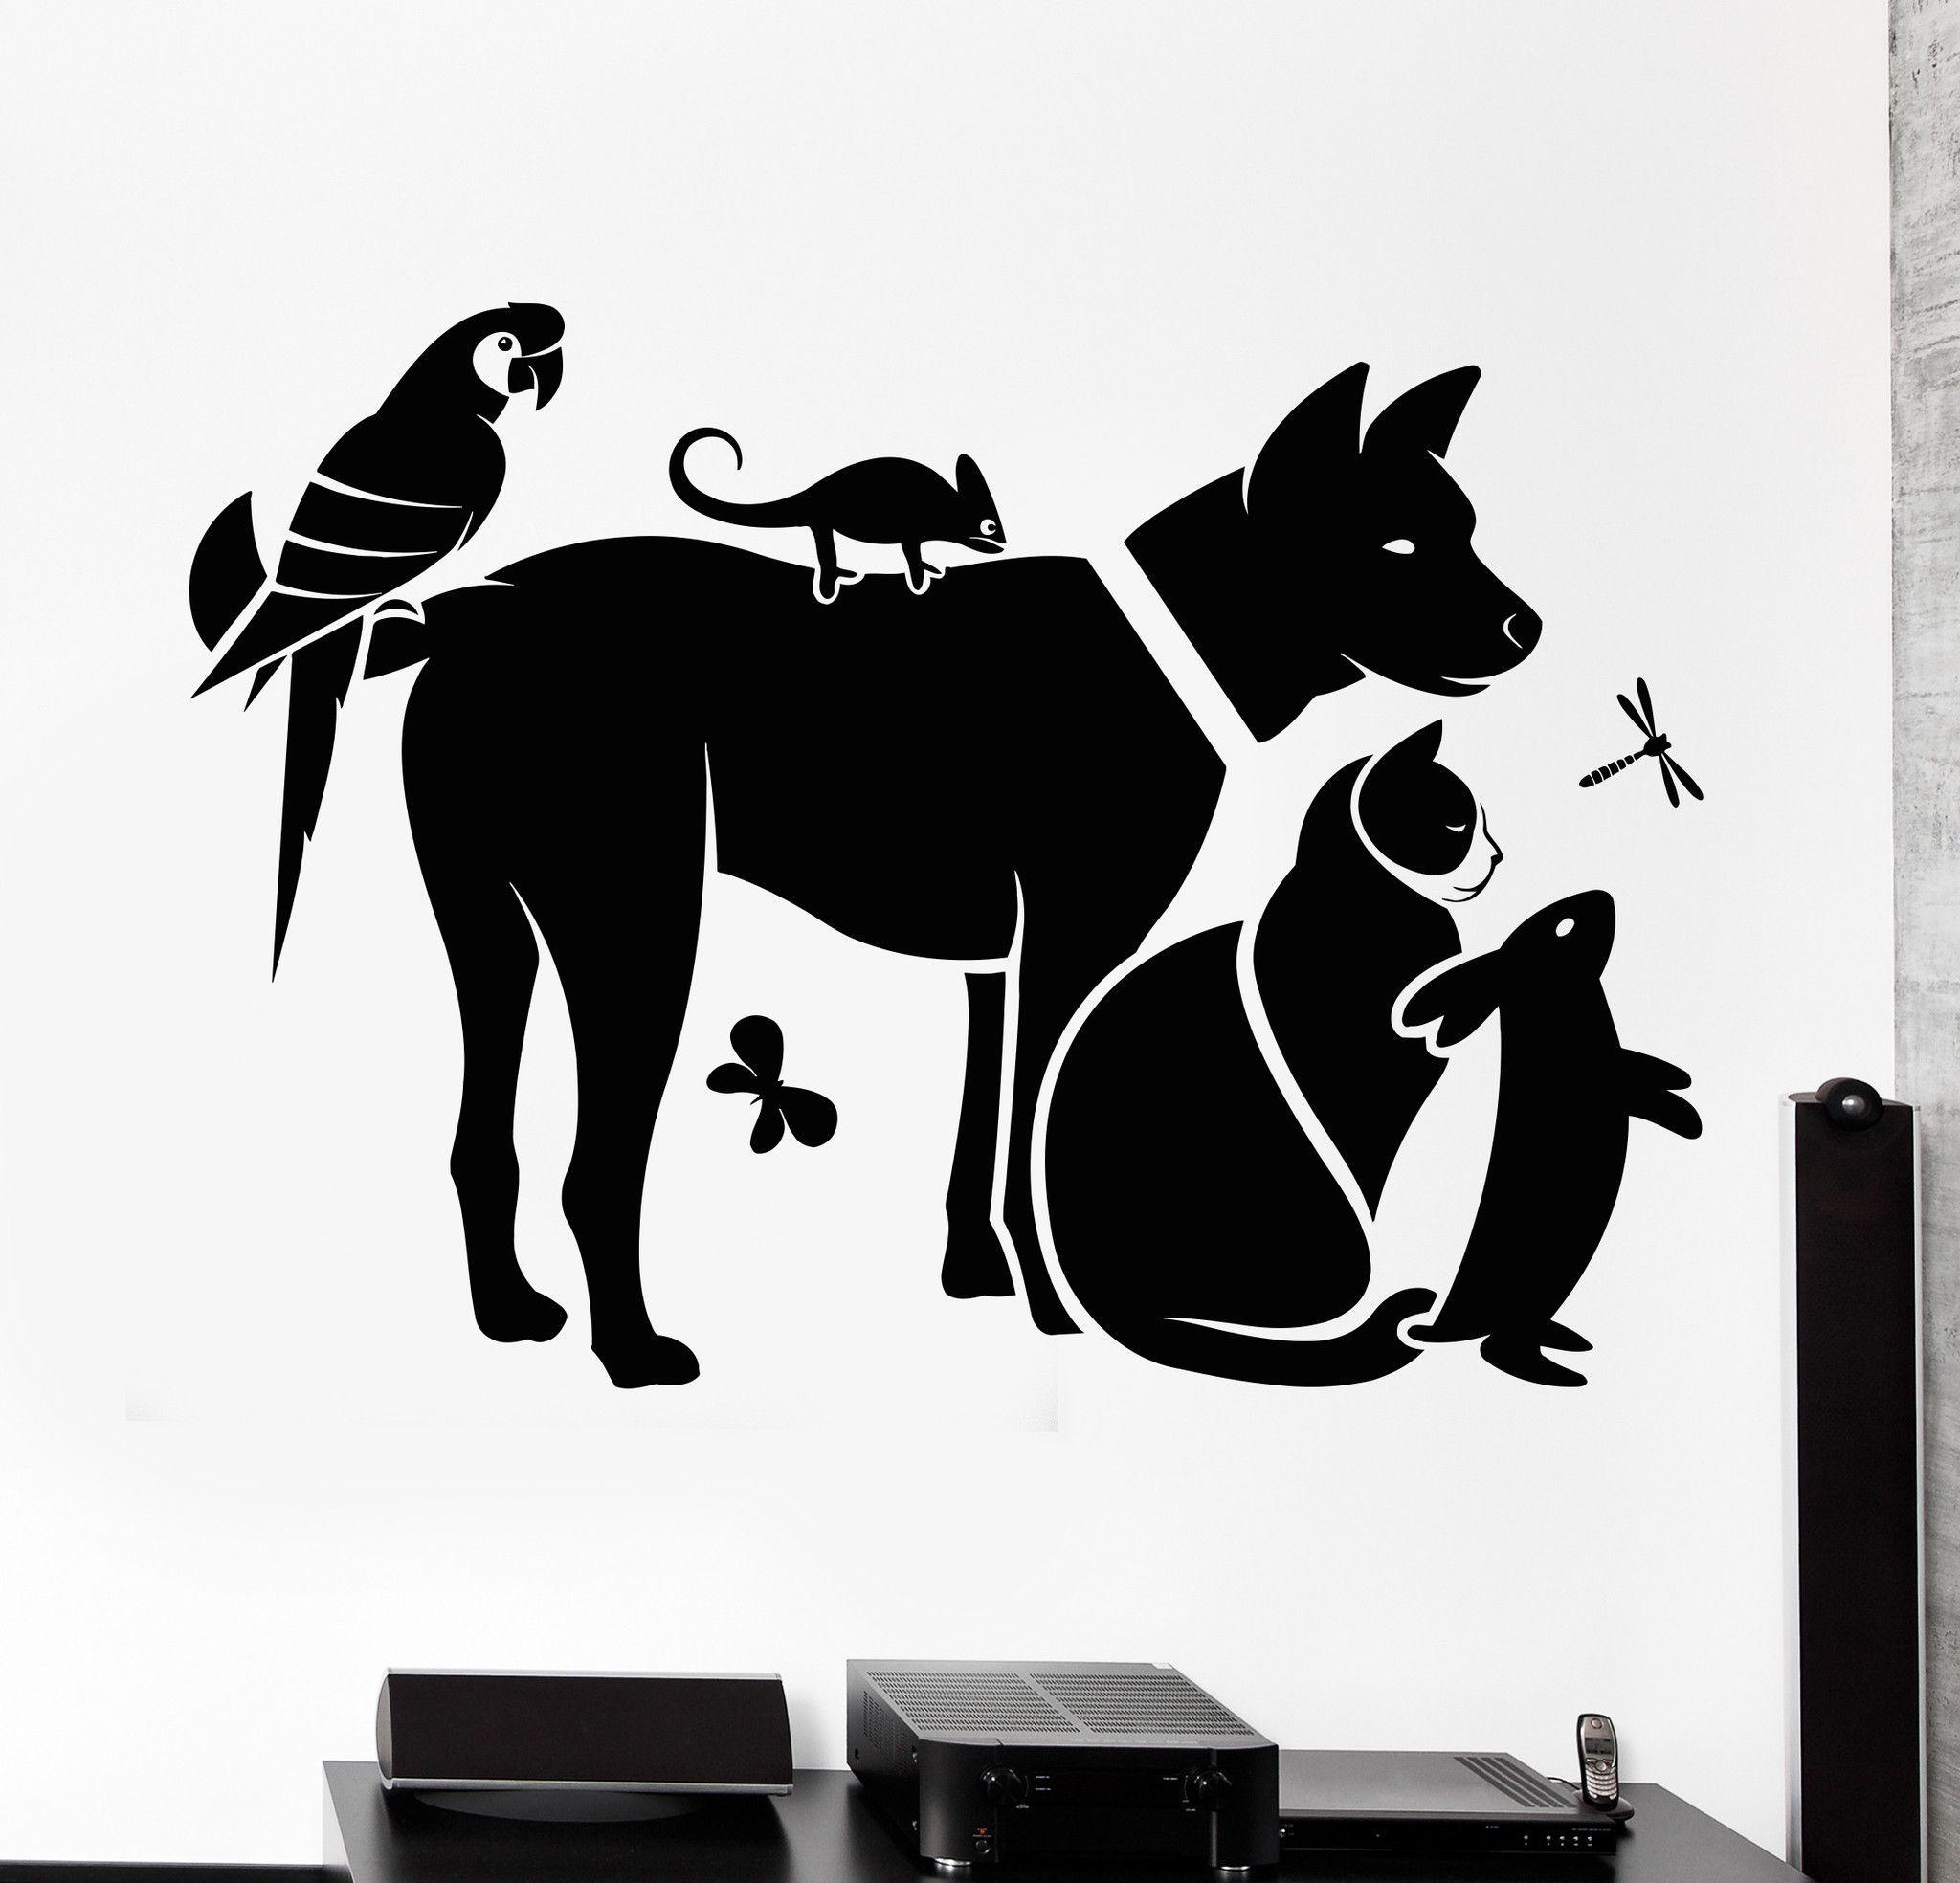 Vinyl Wall Decal Zoo Shop Animals Veterinary Clinic